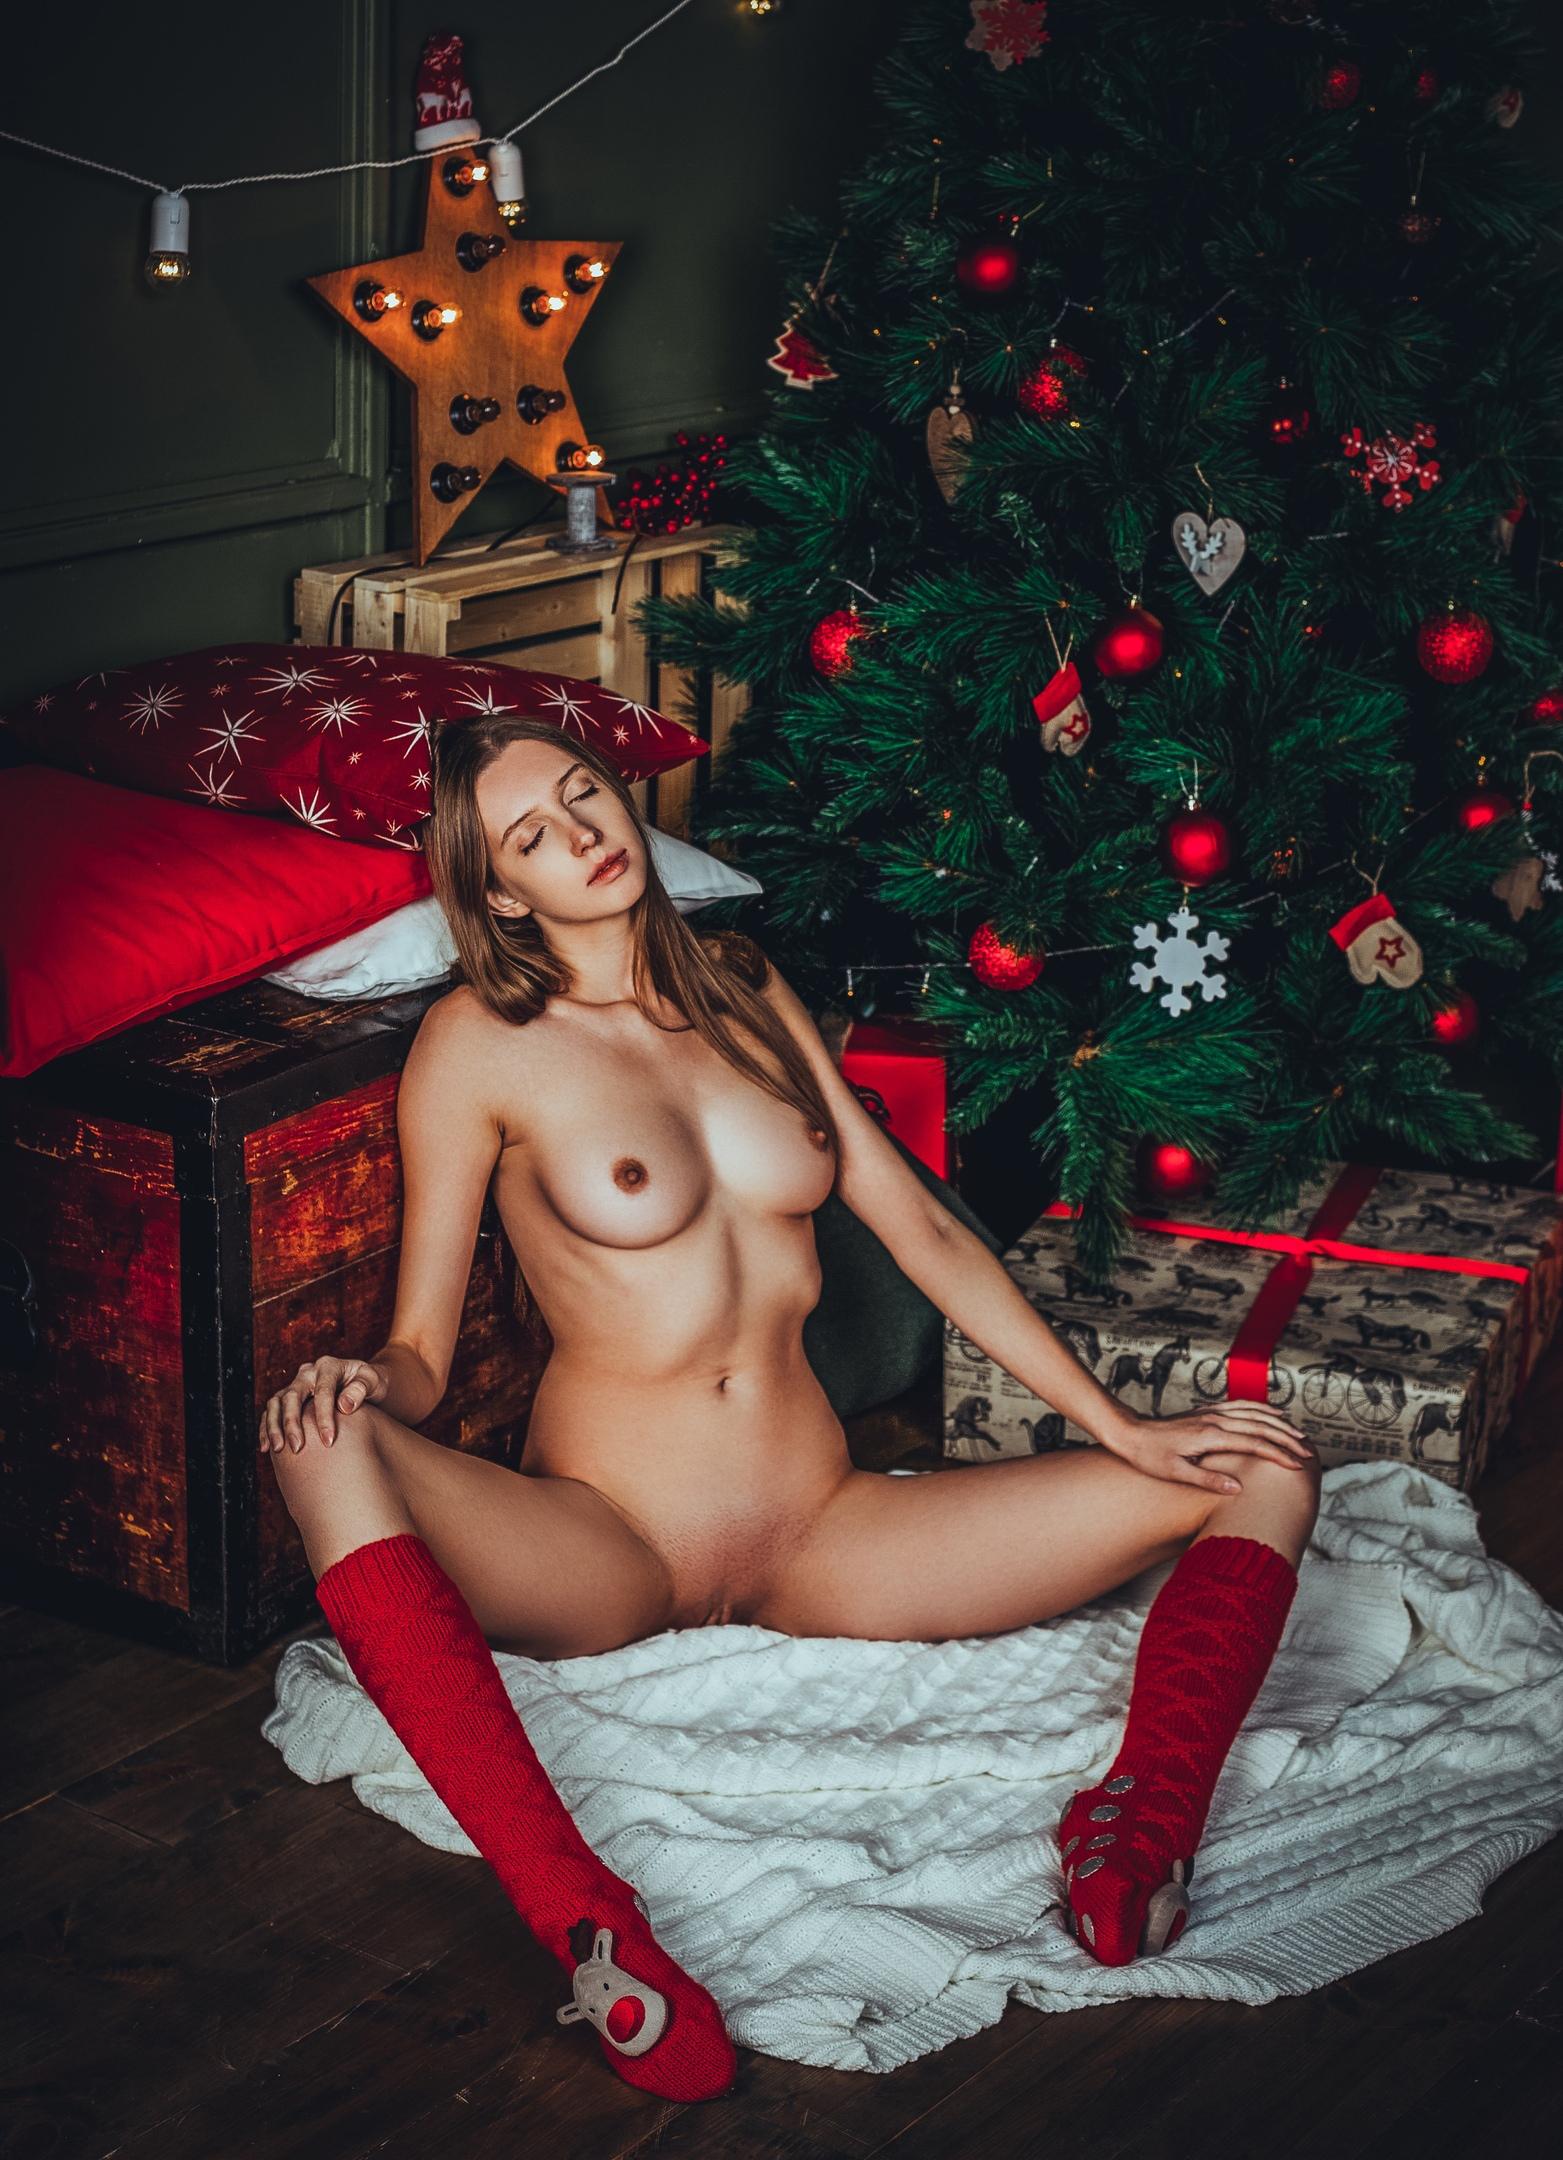 Katerina Reich - Aleksandr Sergeevich photoshoot